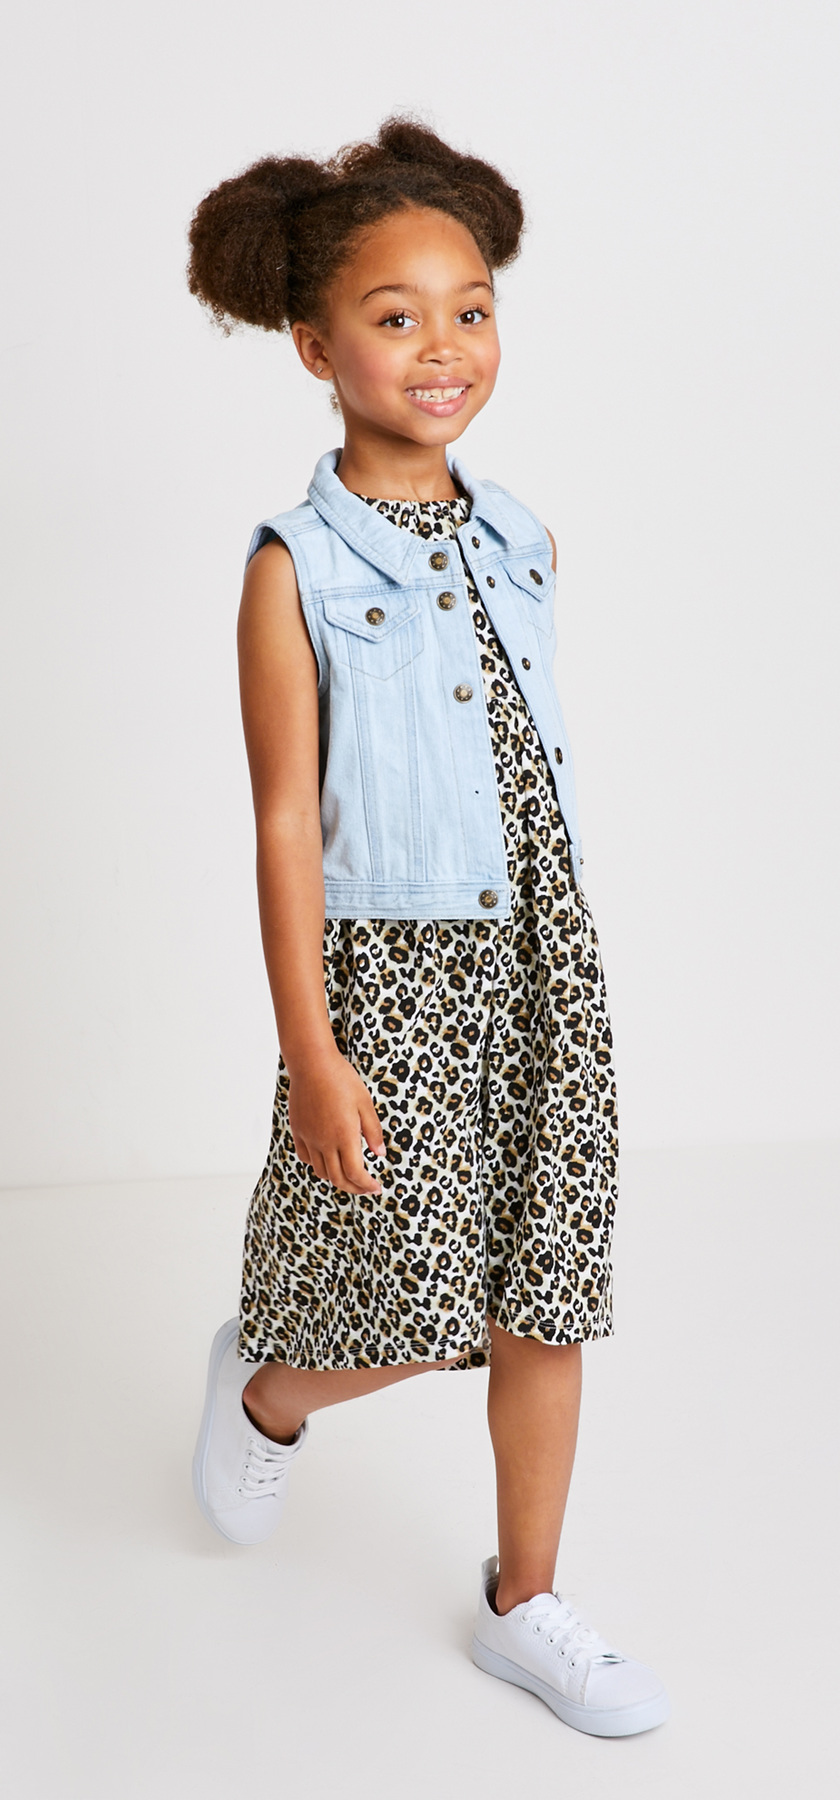 Denim Vest Leopard Dress Outfit - FabKids